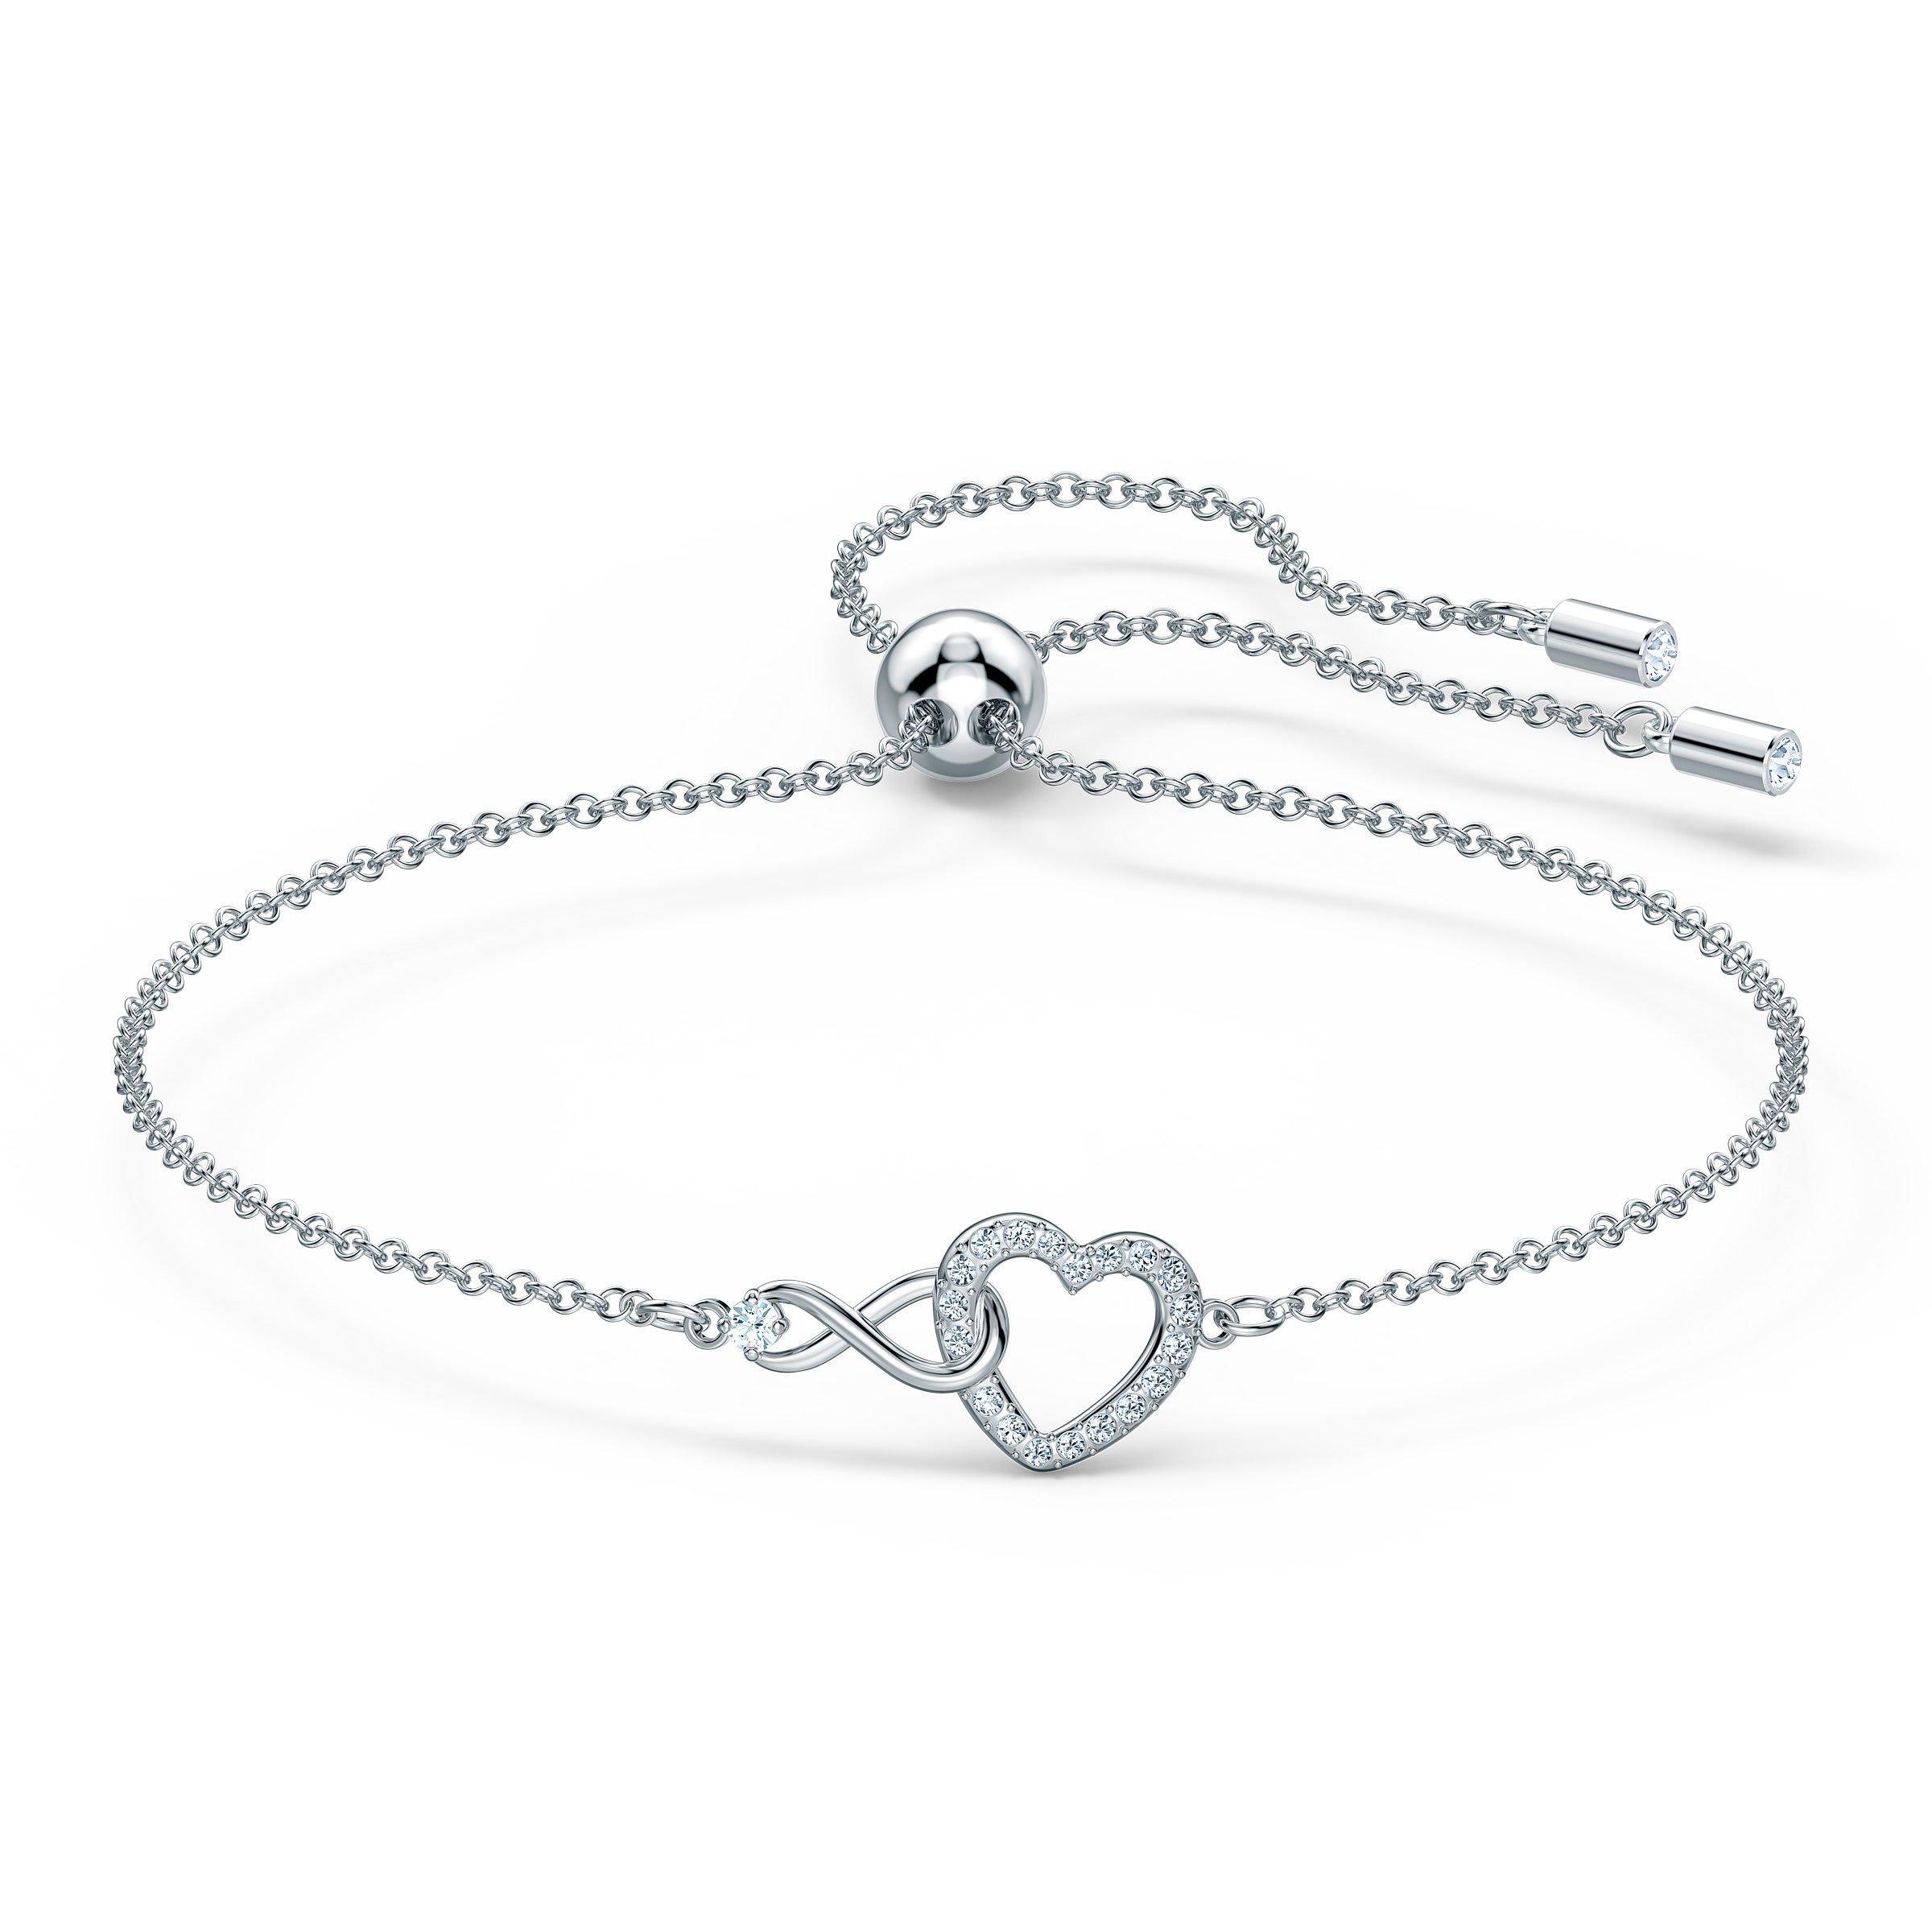 Swarovski Infinity Heart Silver Tone Bracelet